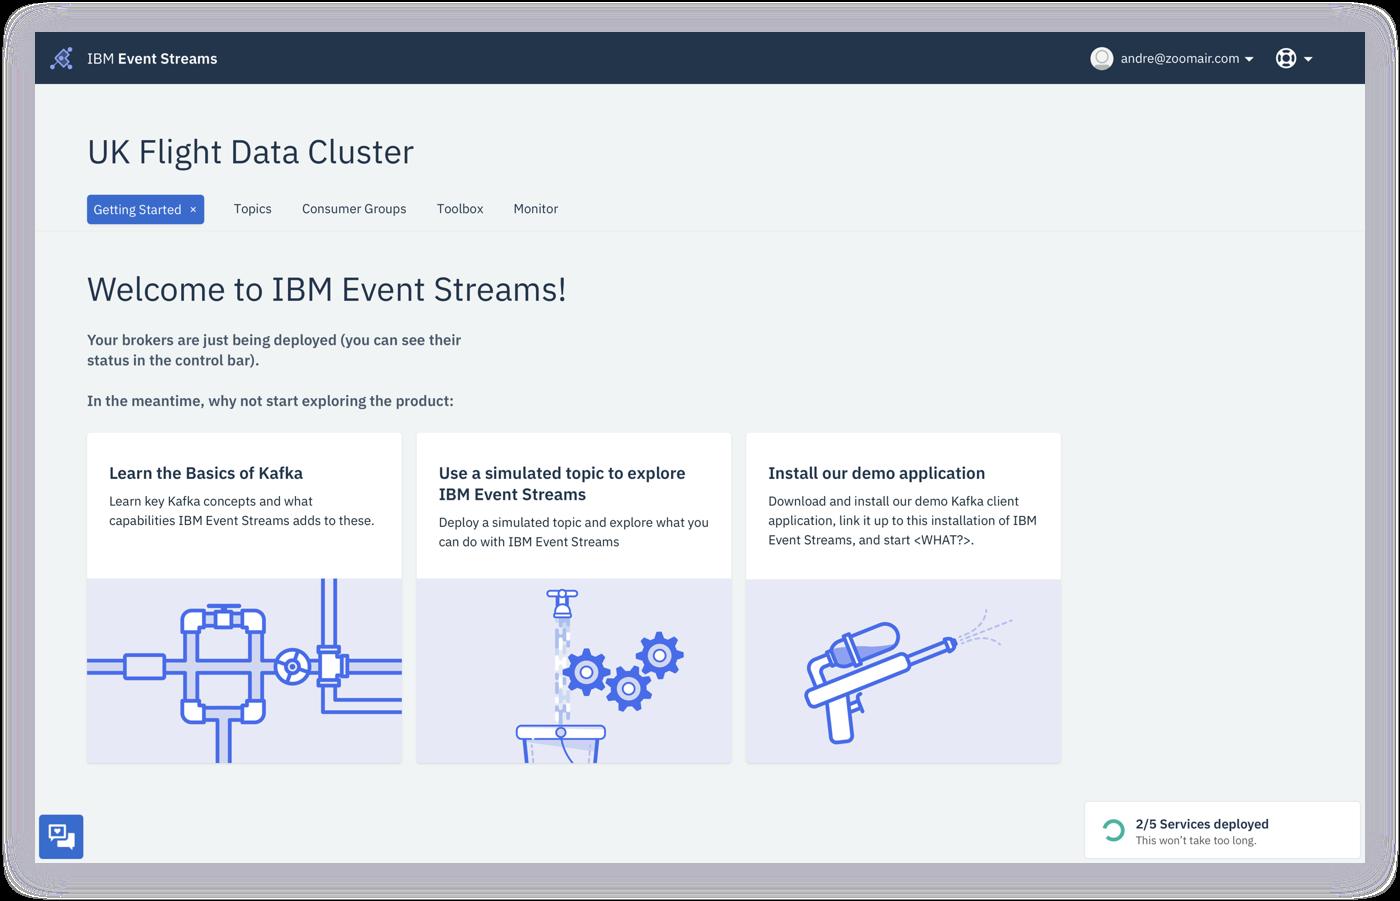 IBM Event Streams